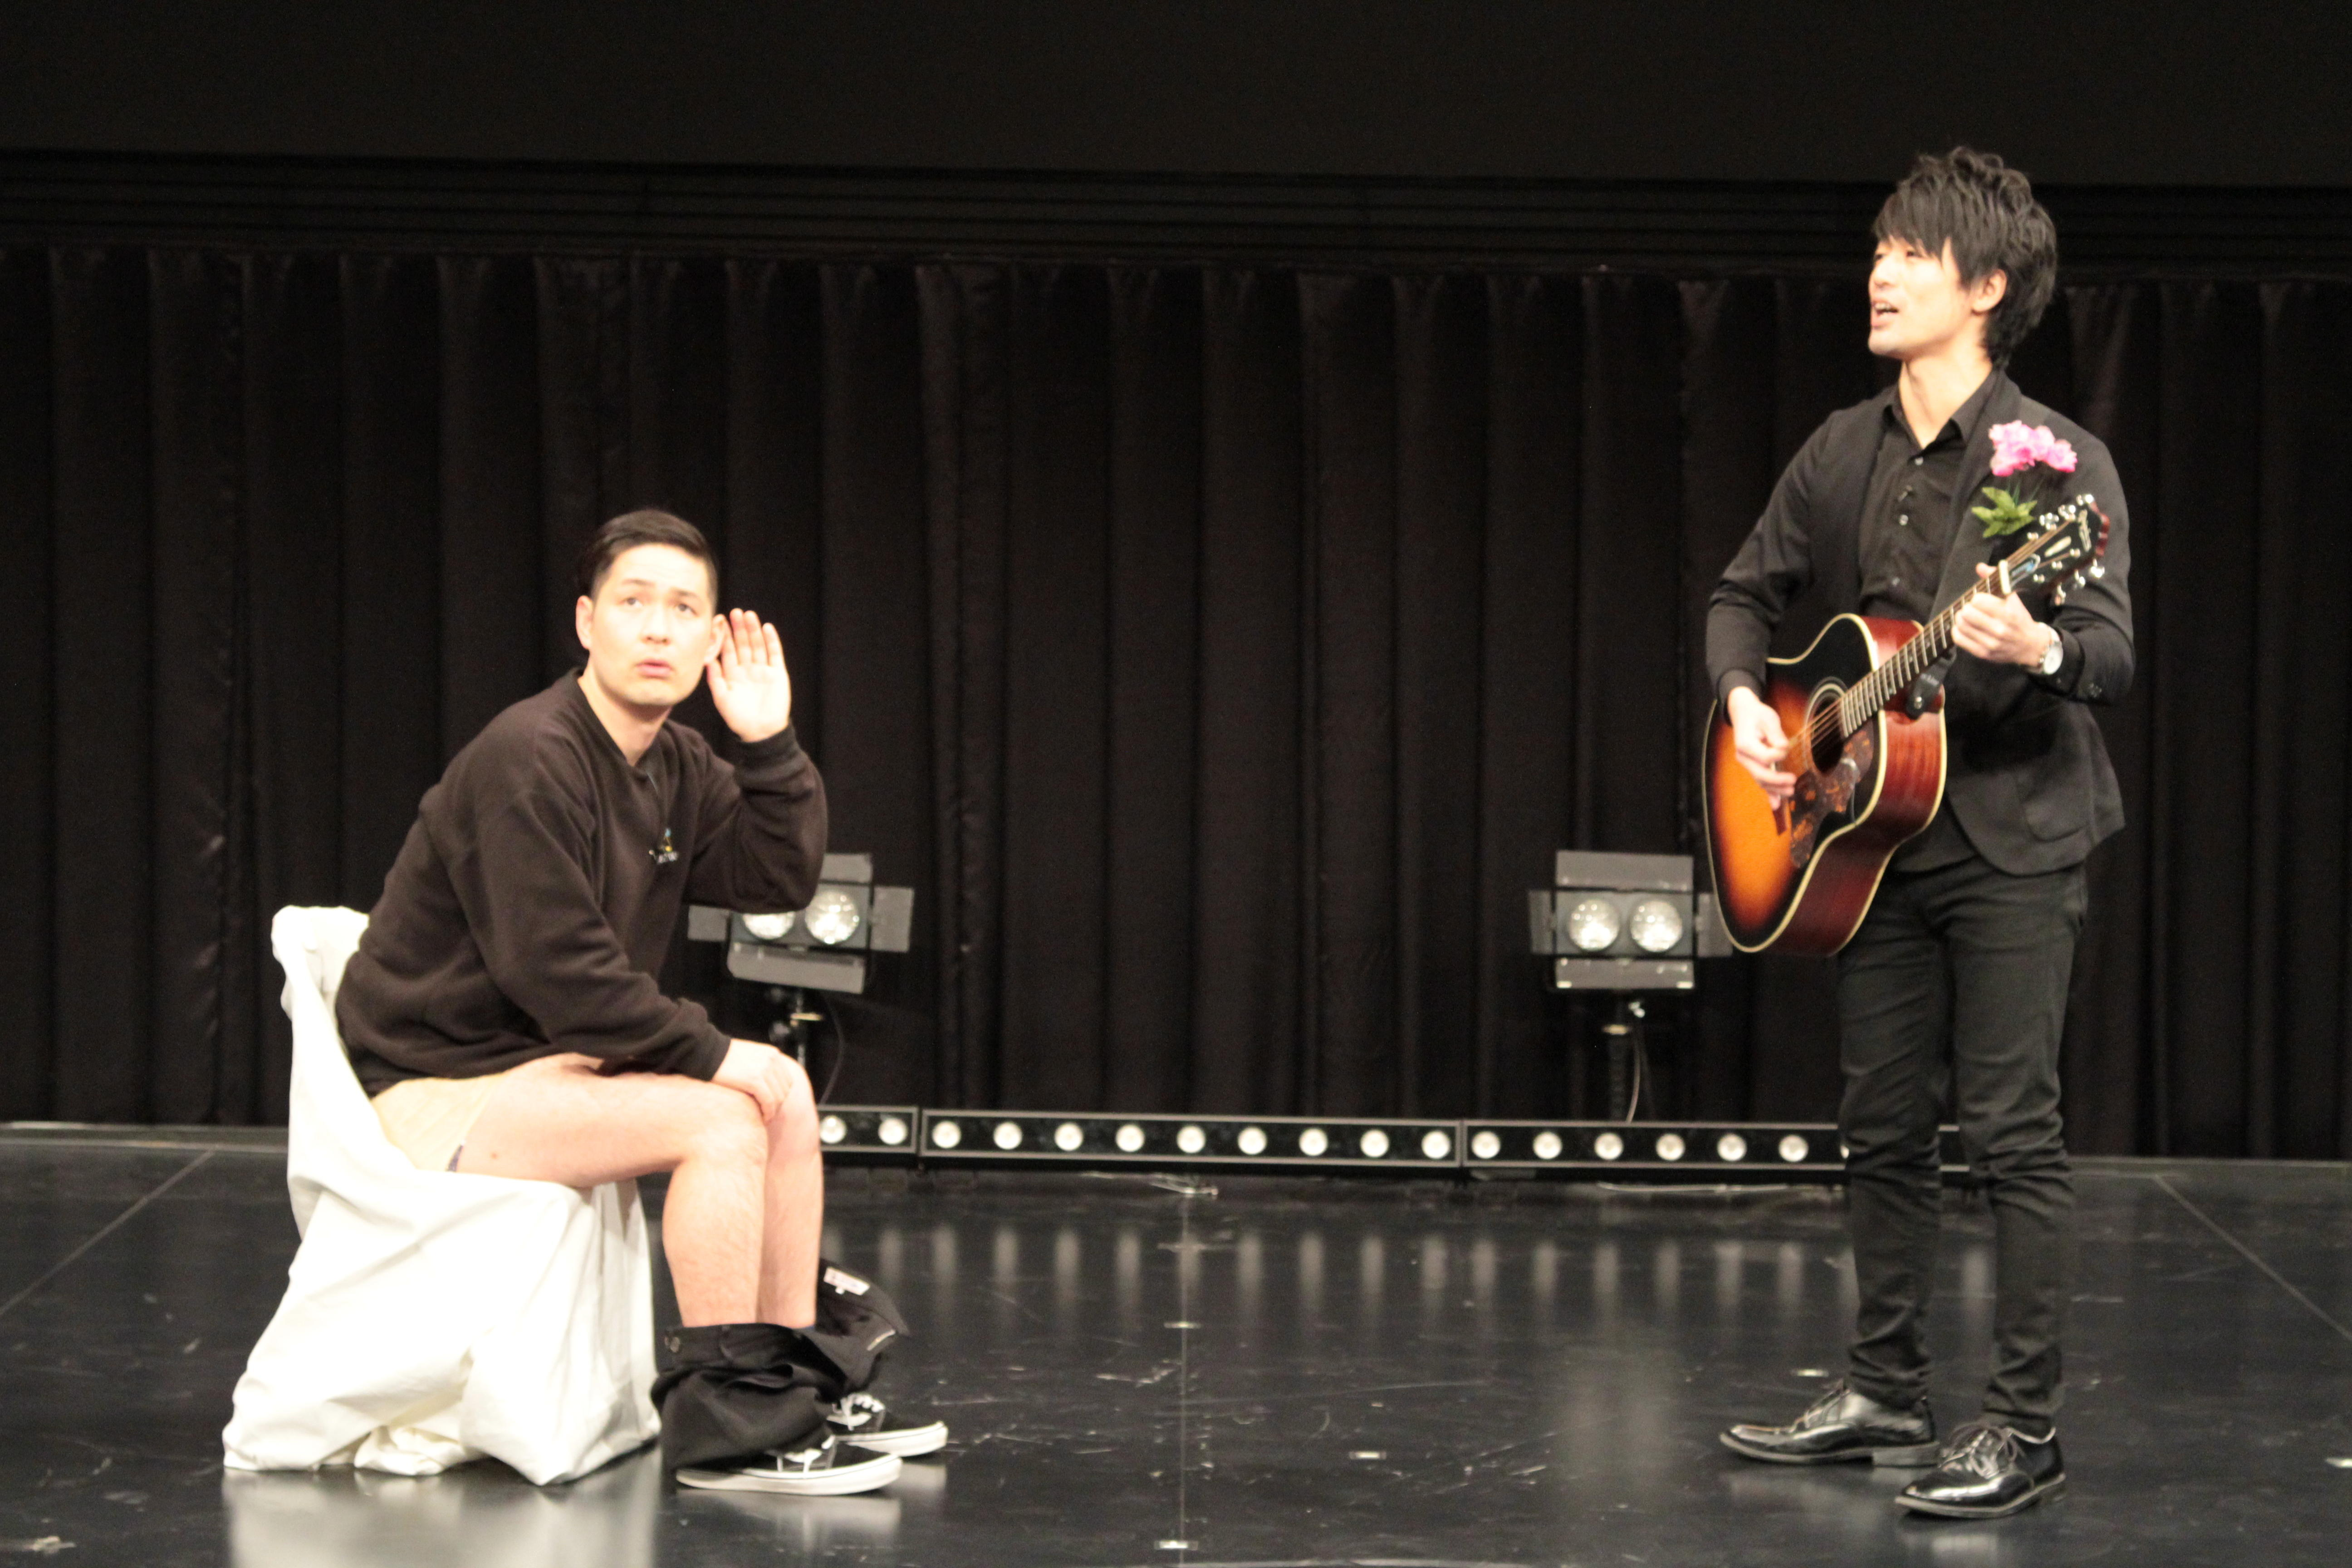 http://news.yoshimoto.co.jp/20190107131853-af18988176260c4ce6819392c0fe2c91e8f2374b.jpg